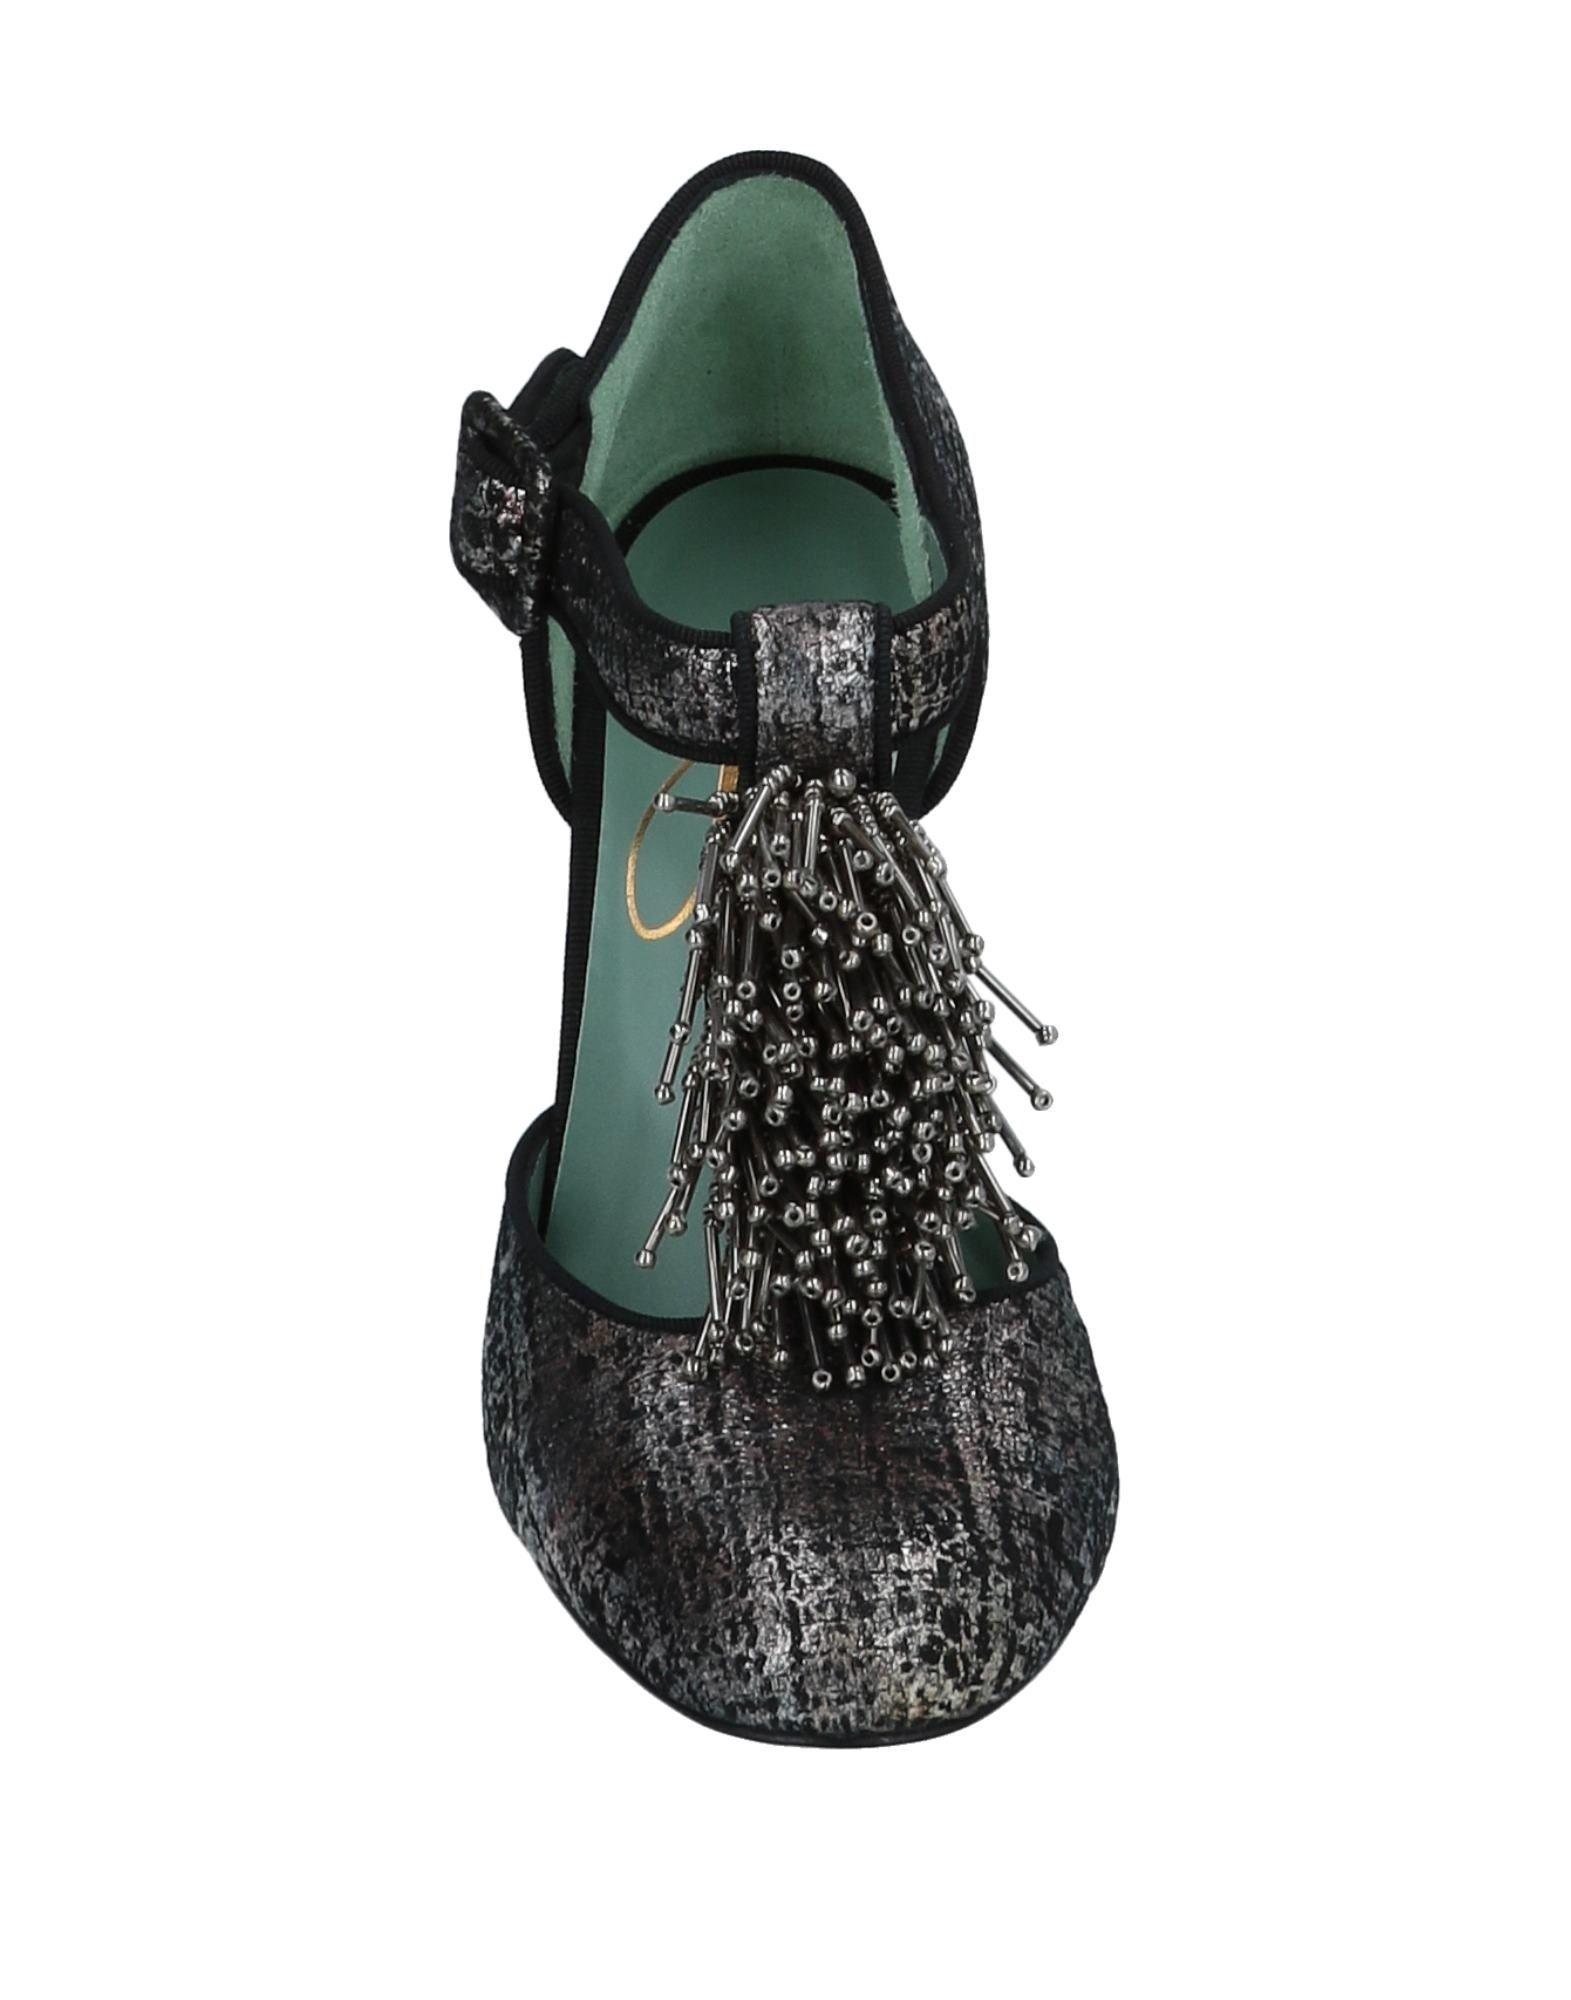 Paola D'arcano aussehende Pumps Damen  11536982OGGut aussehende D'arcano strapazierfähige Schuhe f7e015